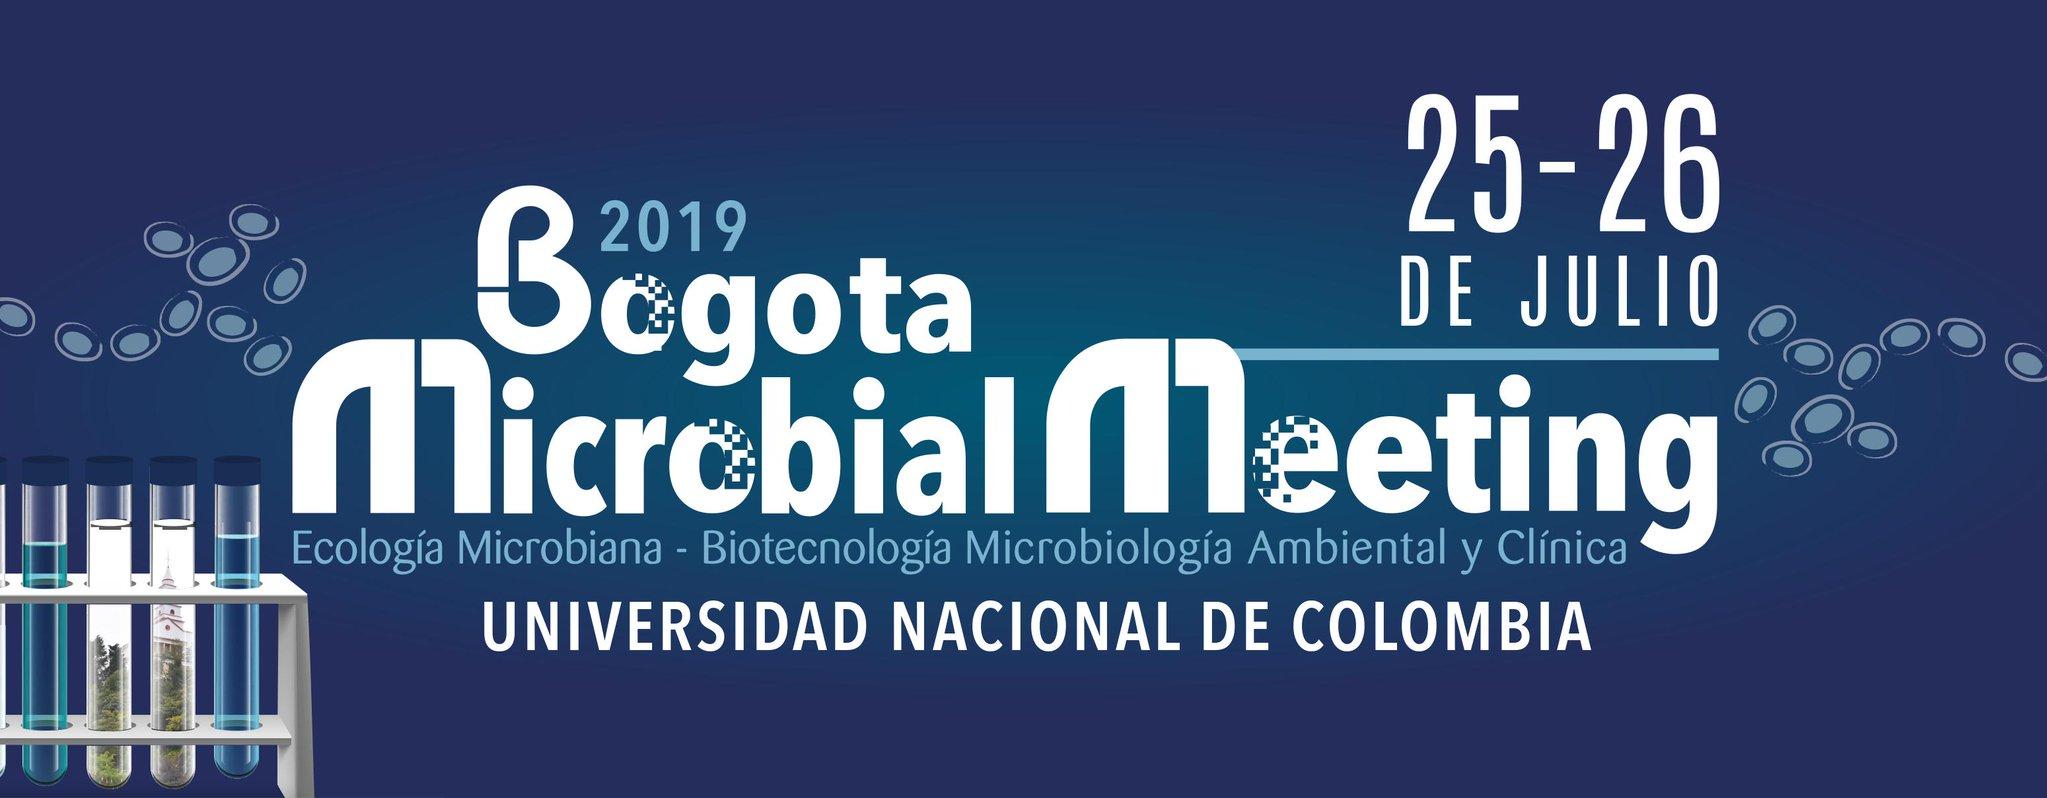 Bogotá Microbial Meeting 2019